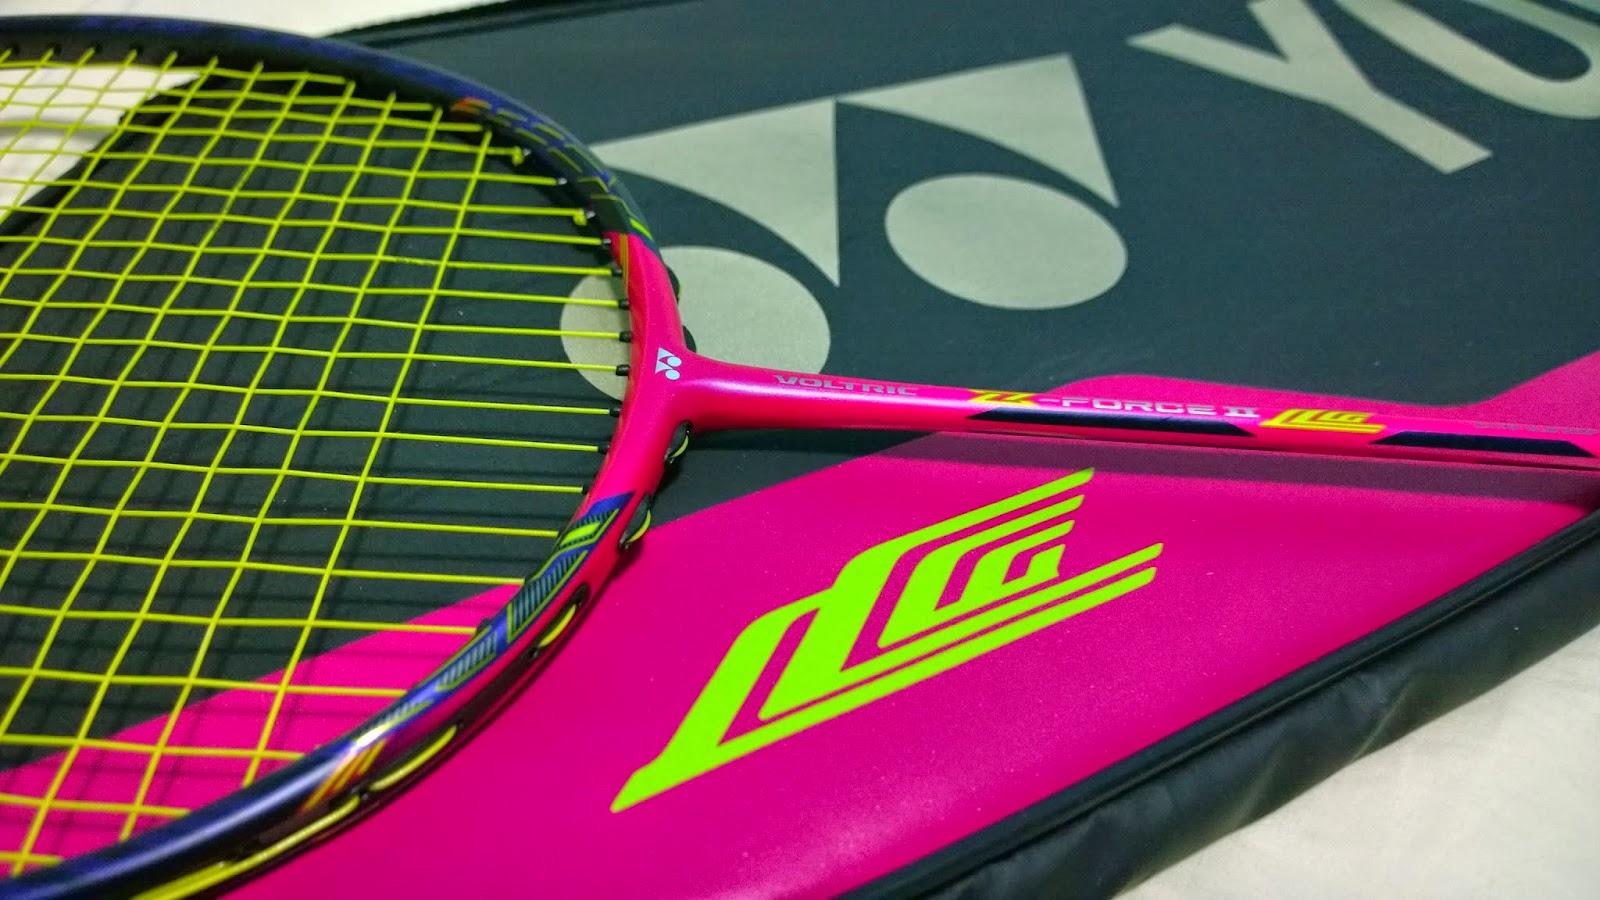 Raket Badminton Yonex Voltric